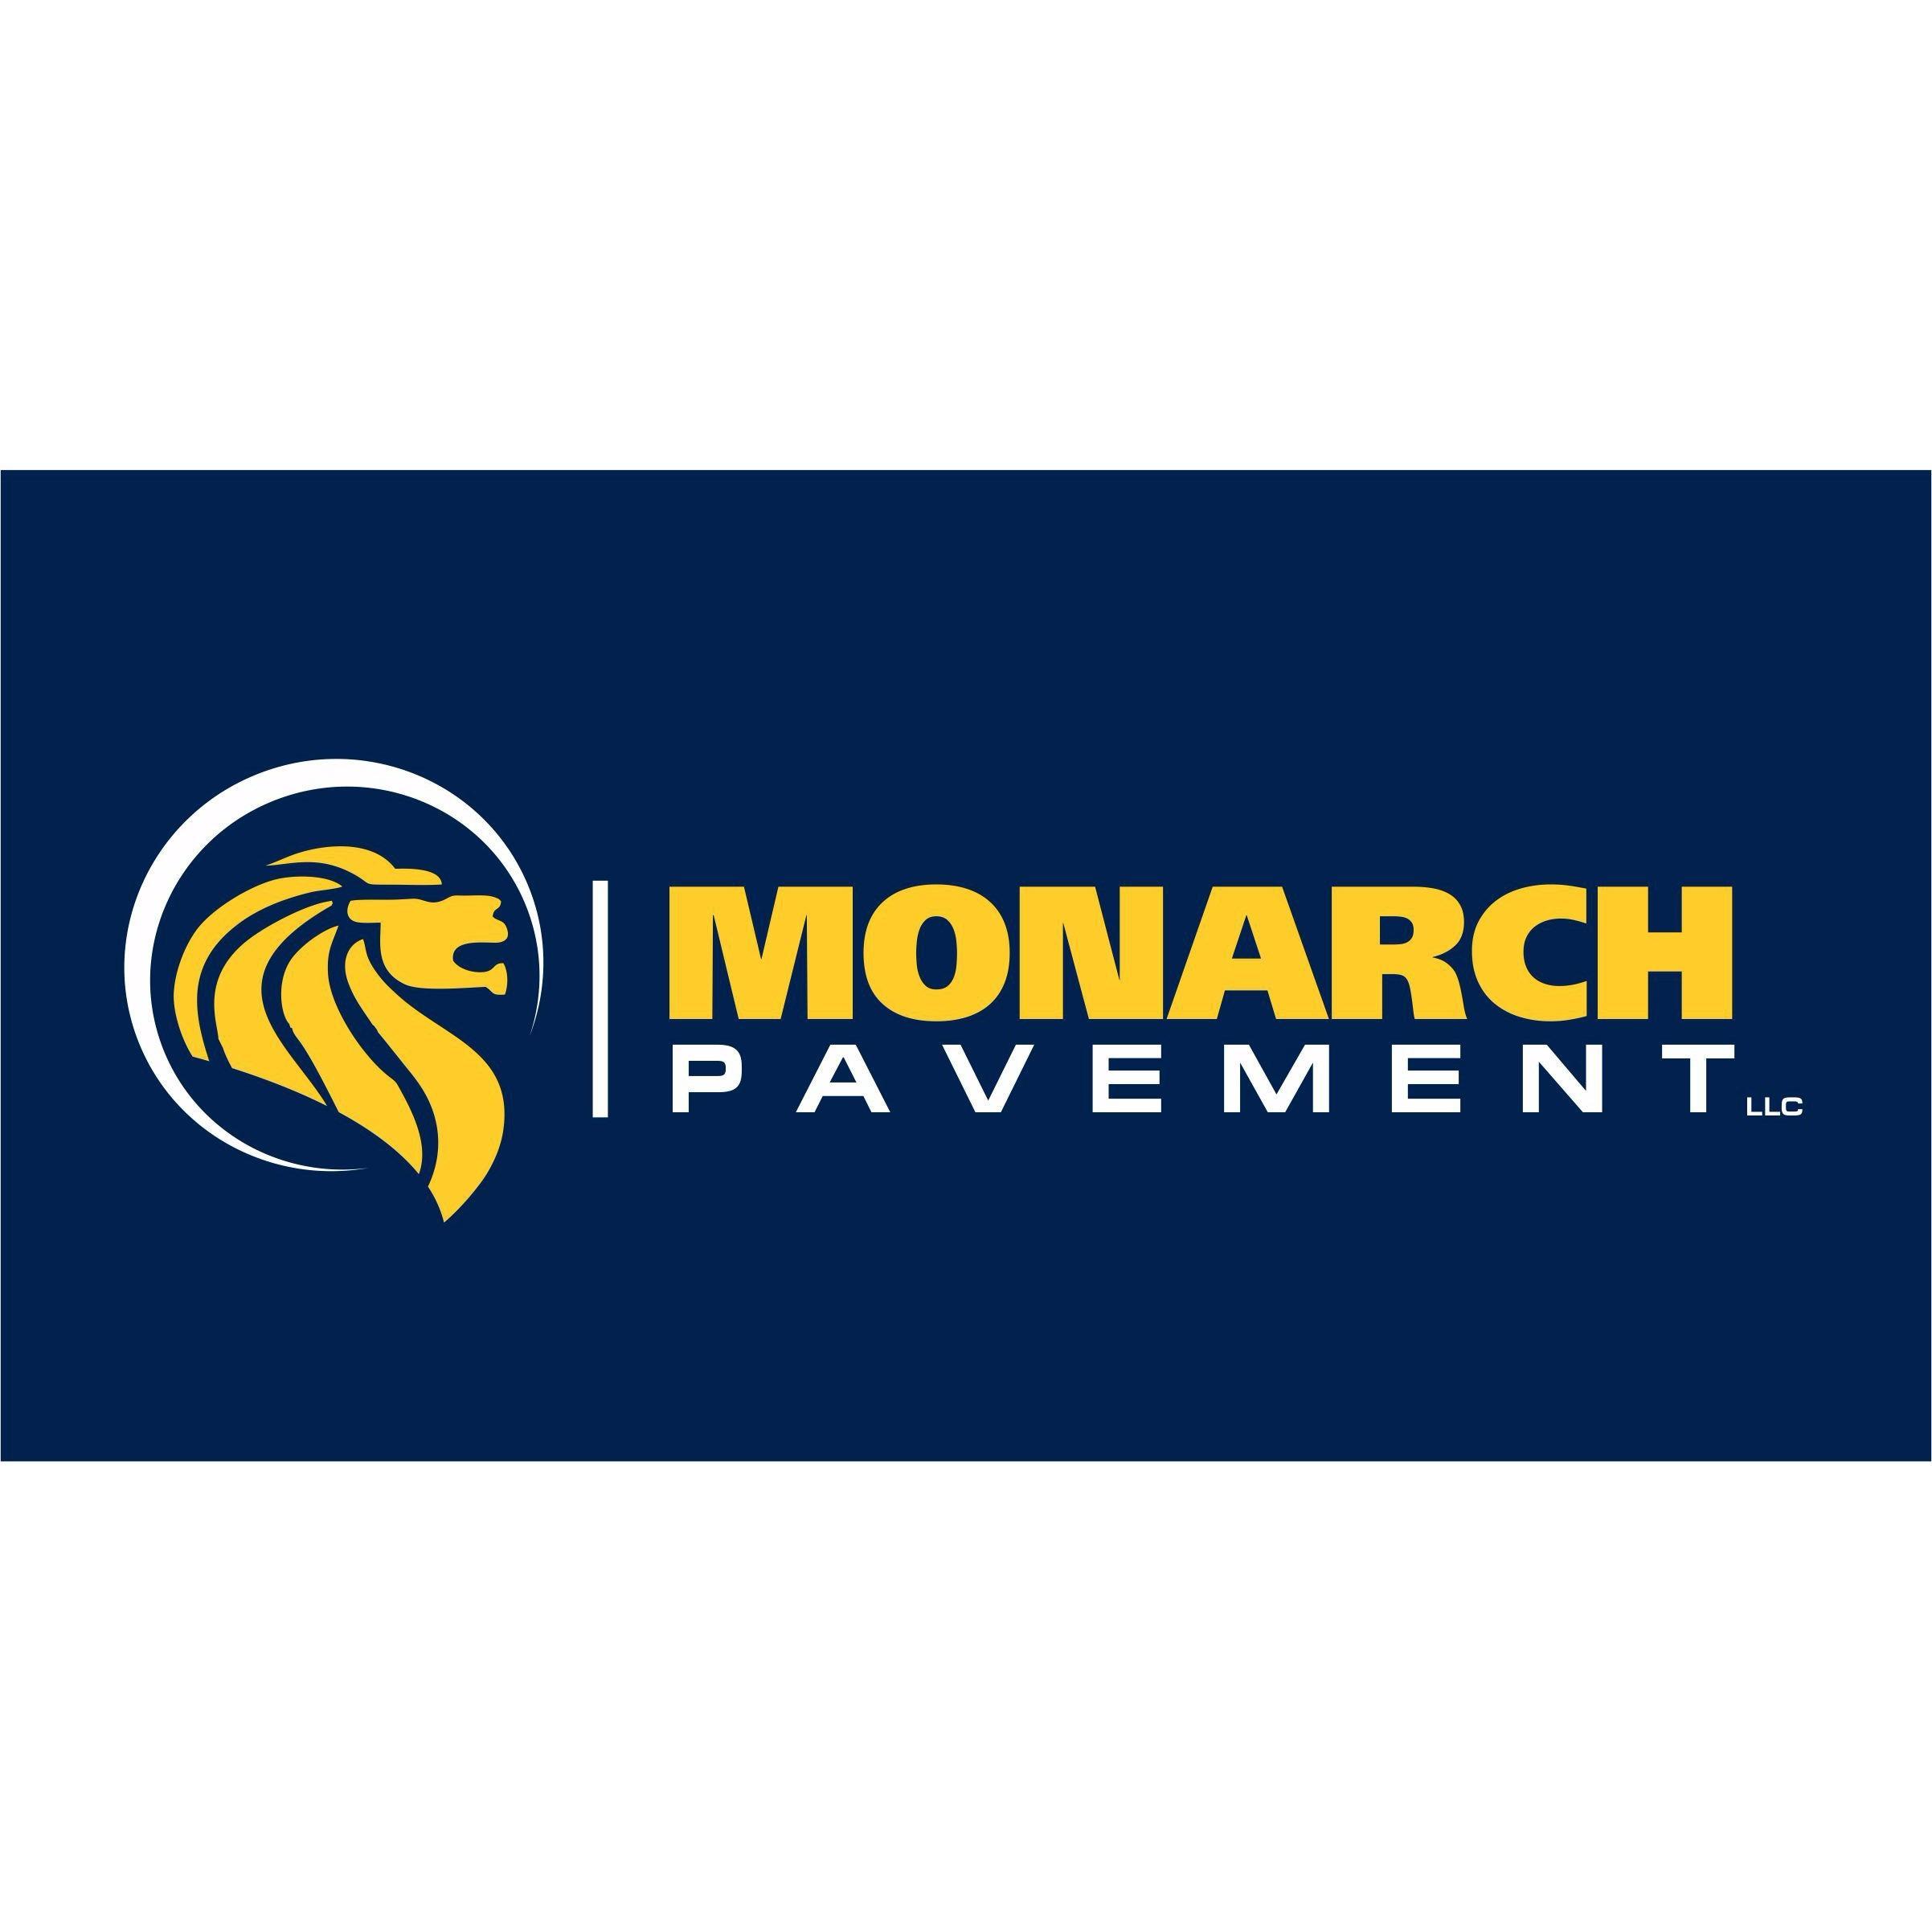 Monarch Pavement LLC